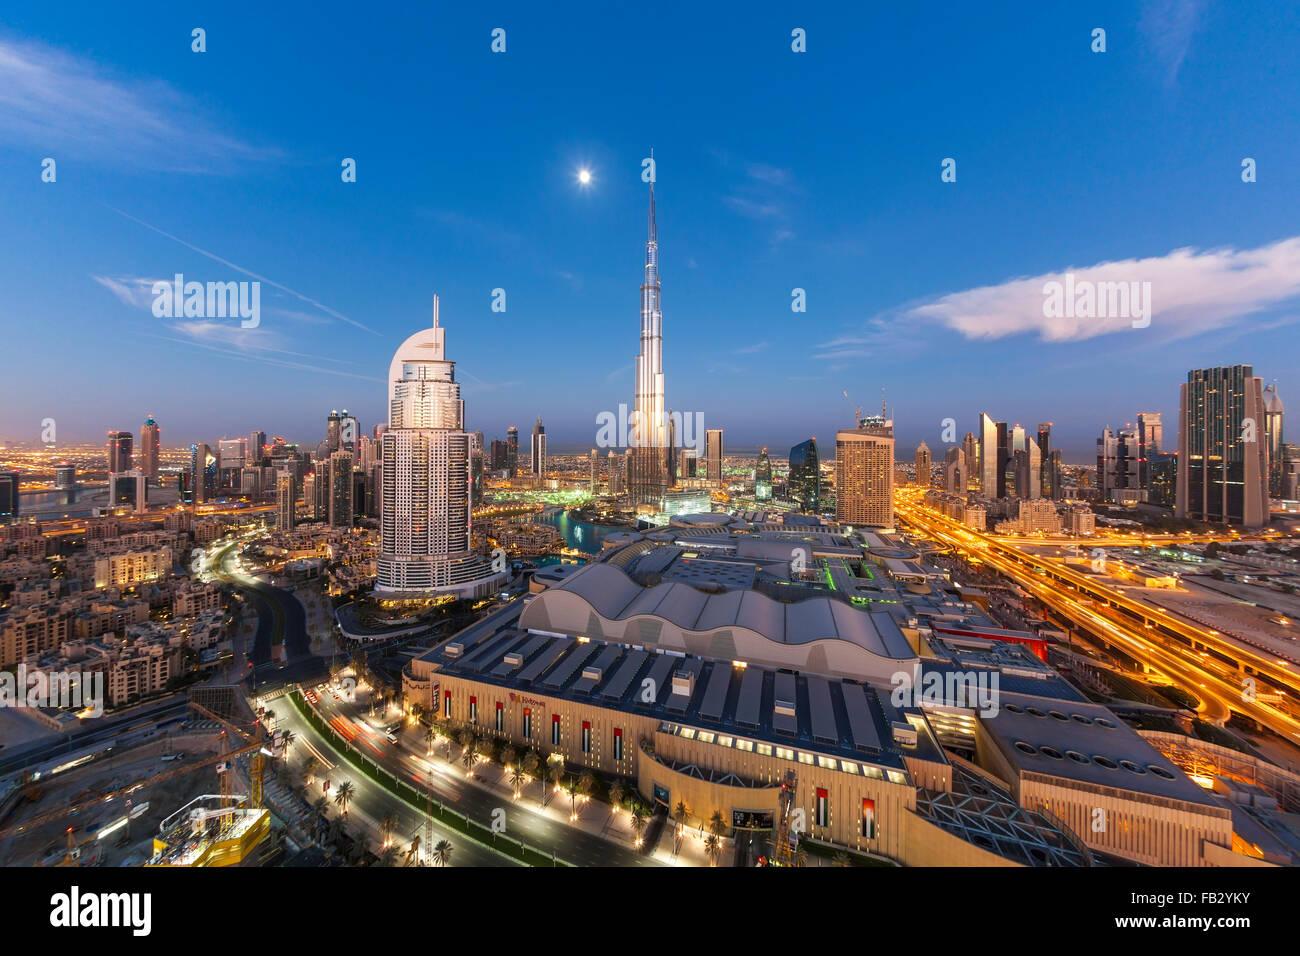 Los Emiratos Árabes Unidos, Dubai, Burj Khalifa, niveles elevados de vista sobre el centro comercial Dubai Mall Foto de stock